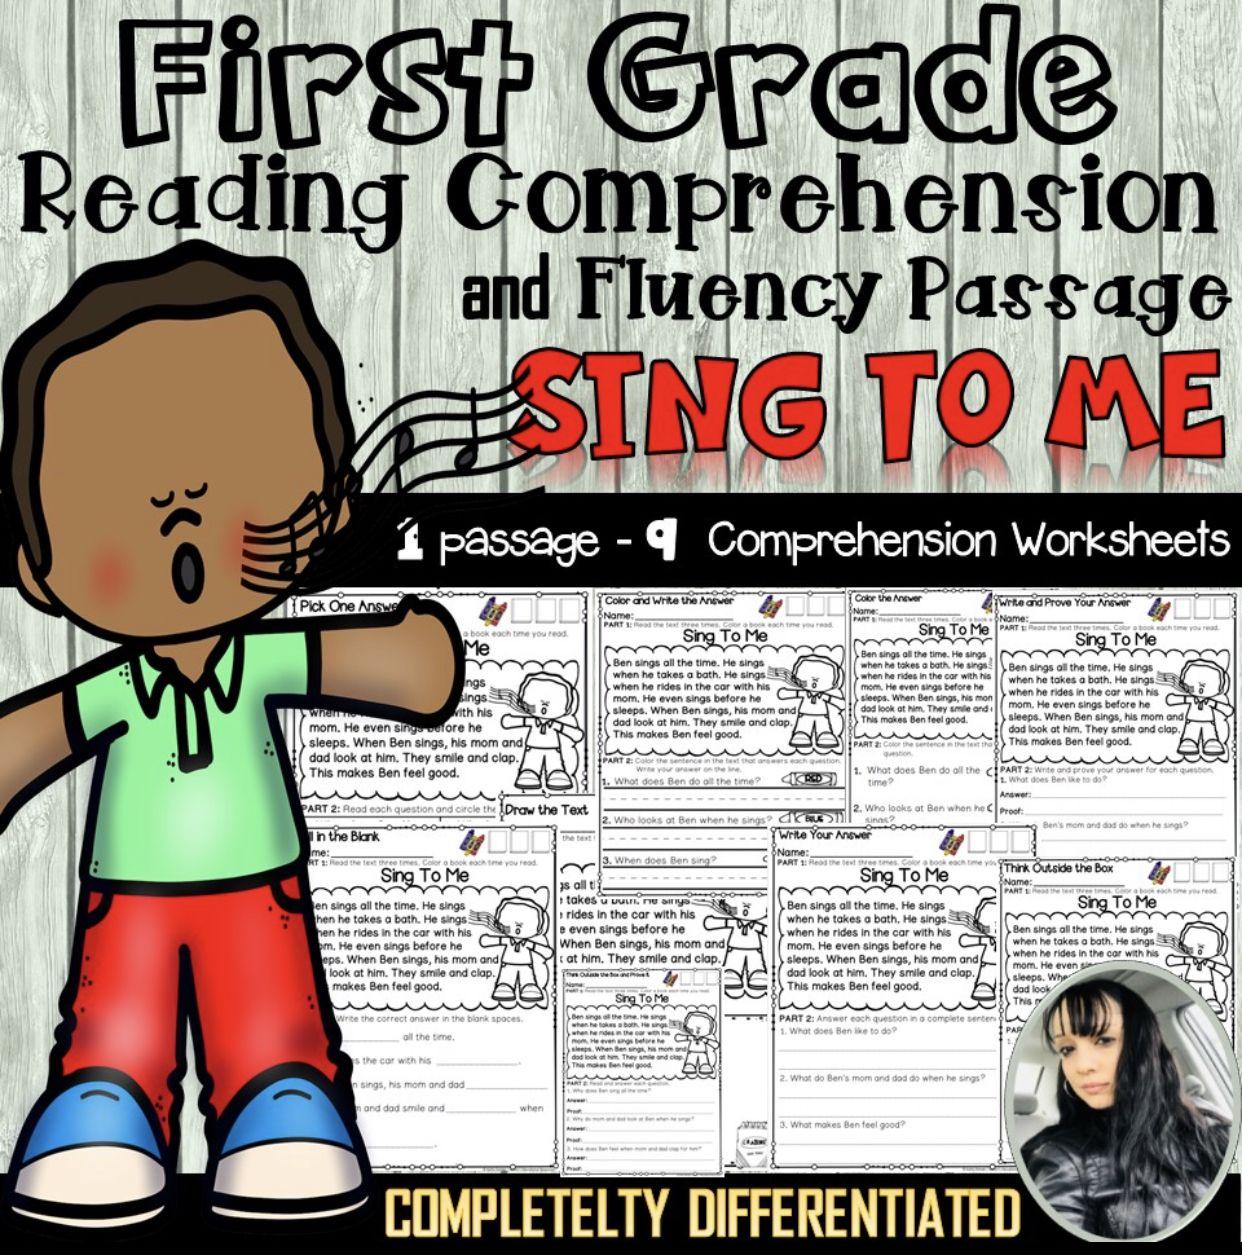 First Grade Reading Comprehension Worksheets